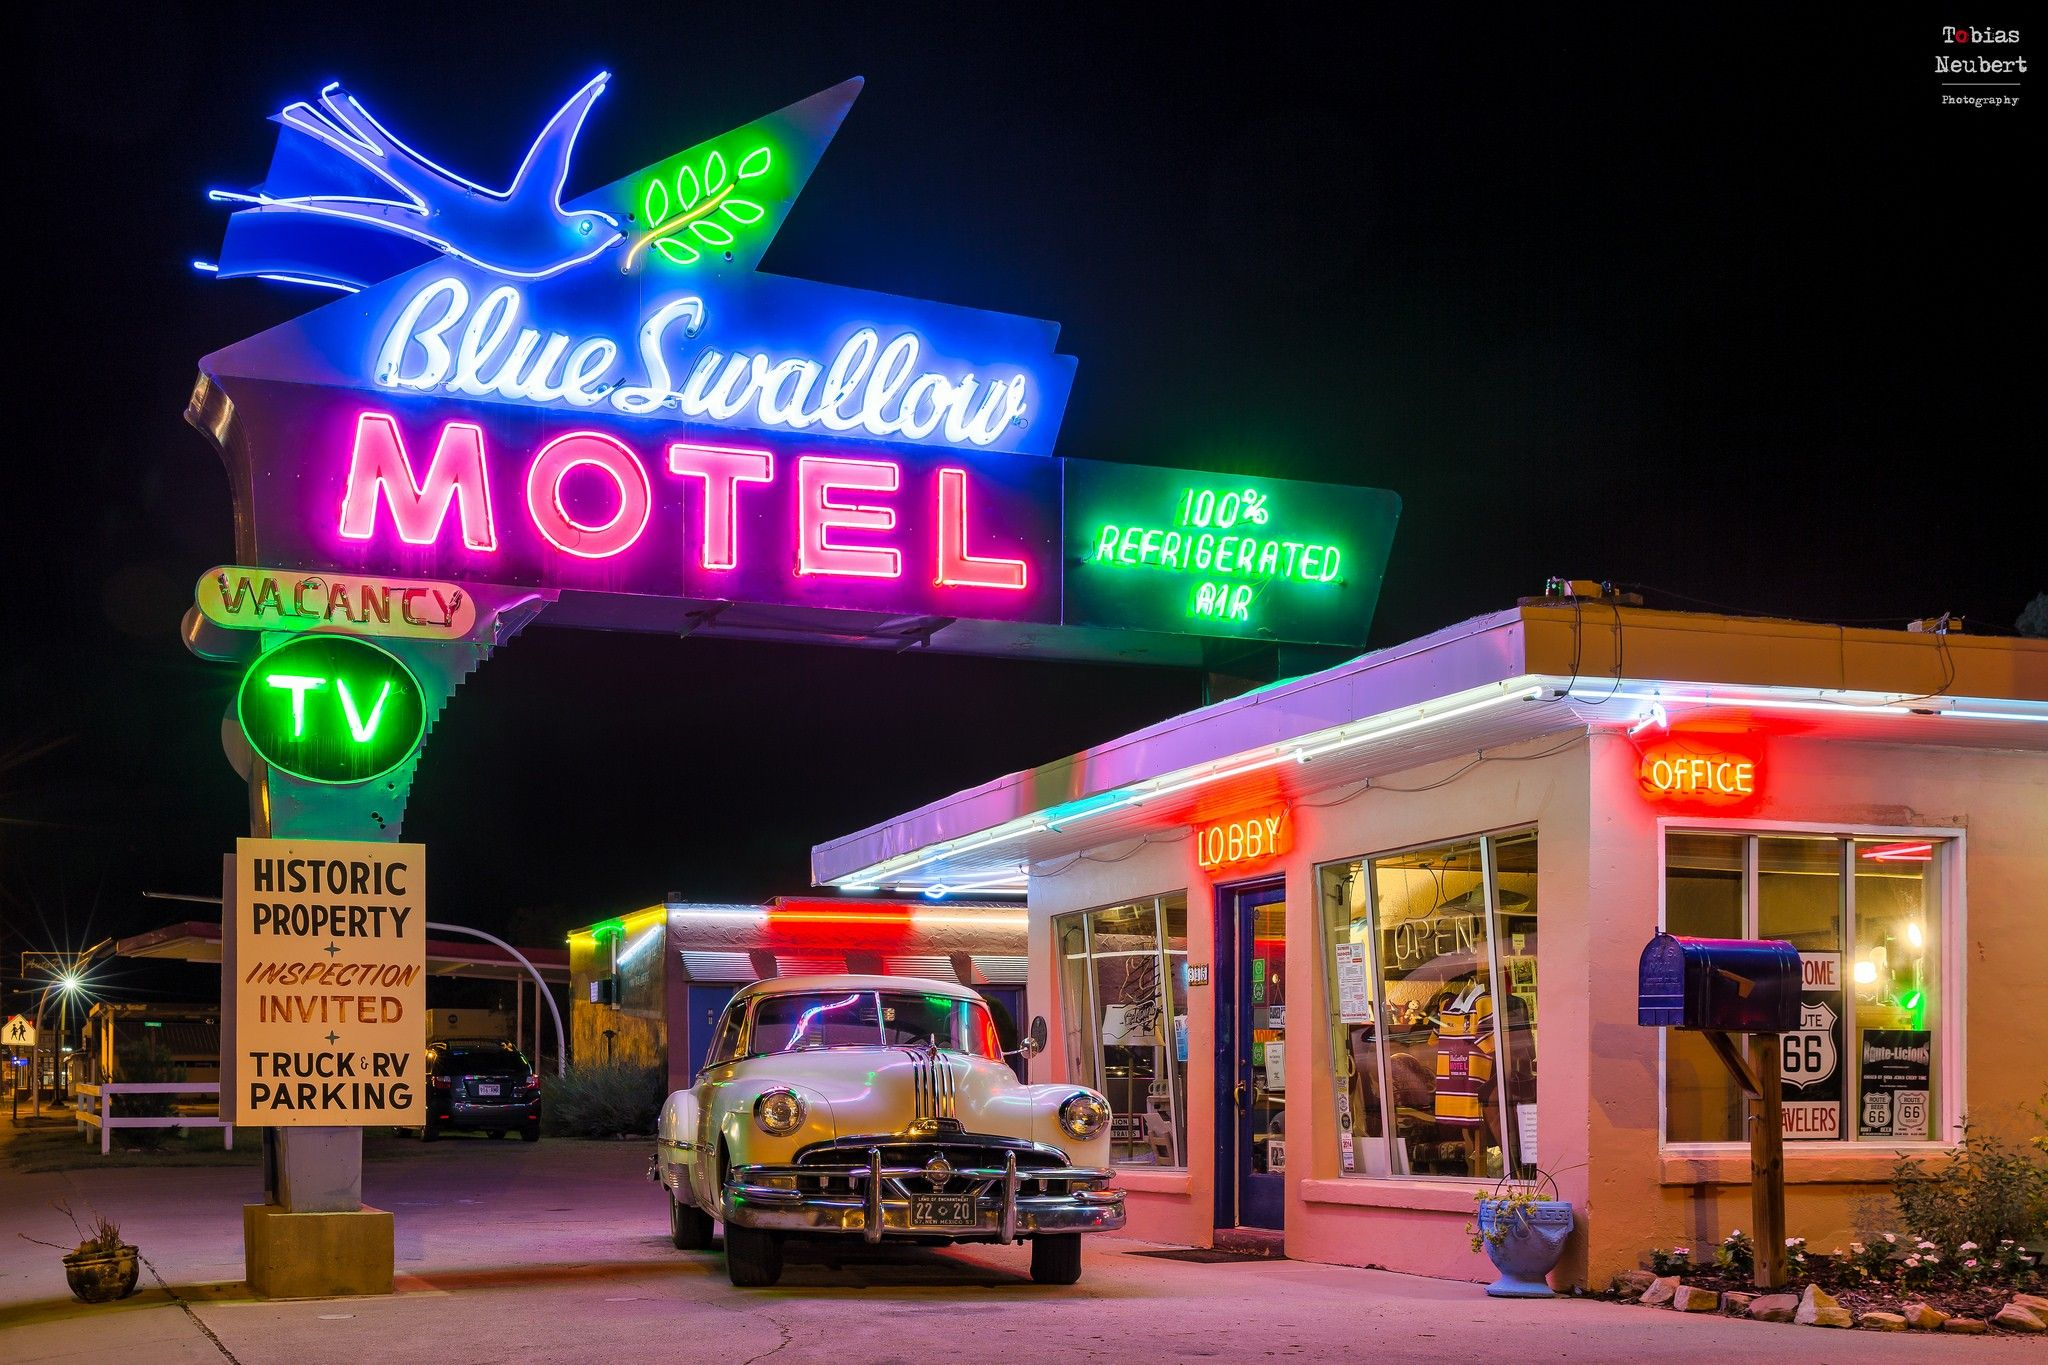 2955161980svintage.jpg (2048×1365) Blue swallow motel